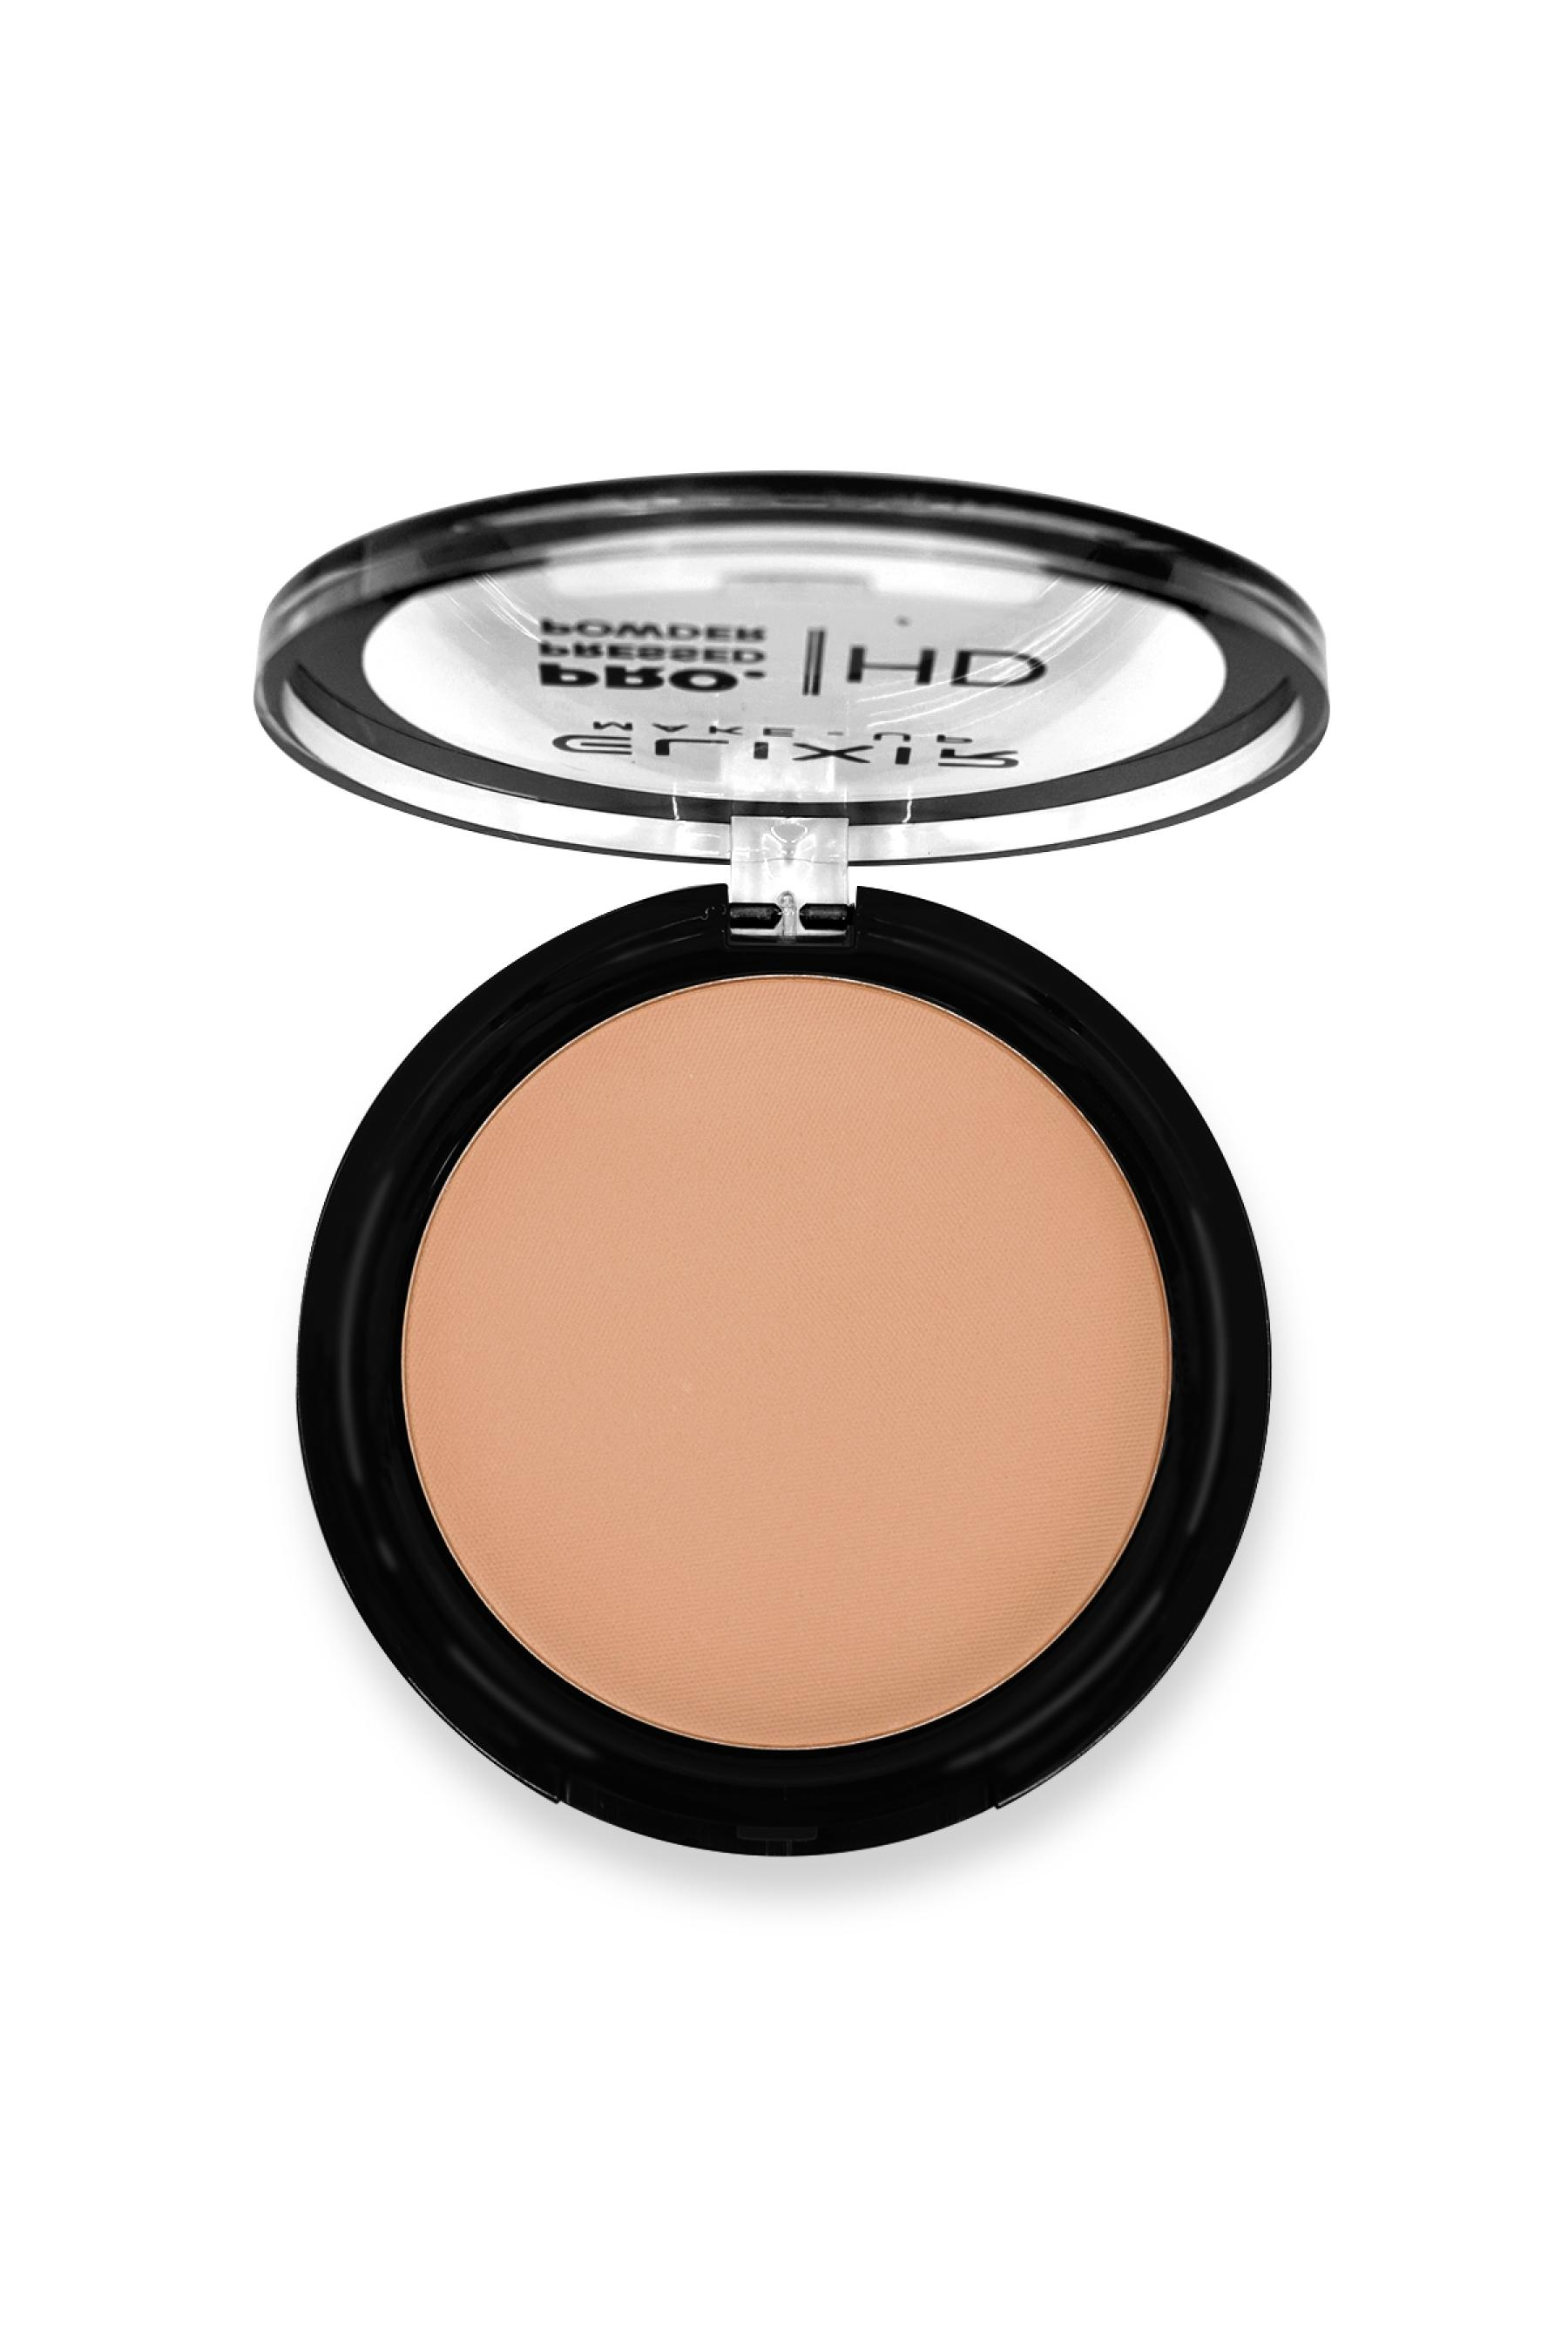 PRO. Pressed Powder HD 203 (Smooth Cocoa)